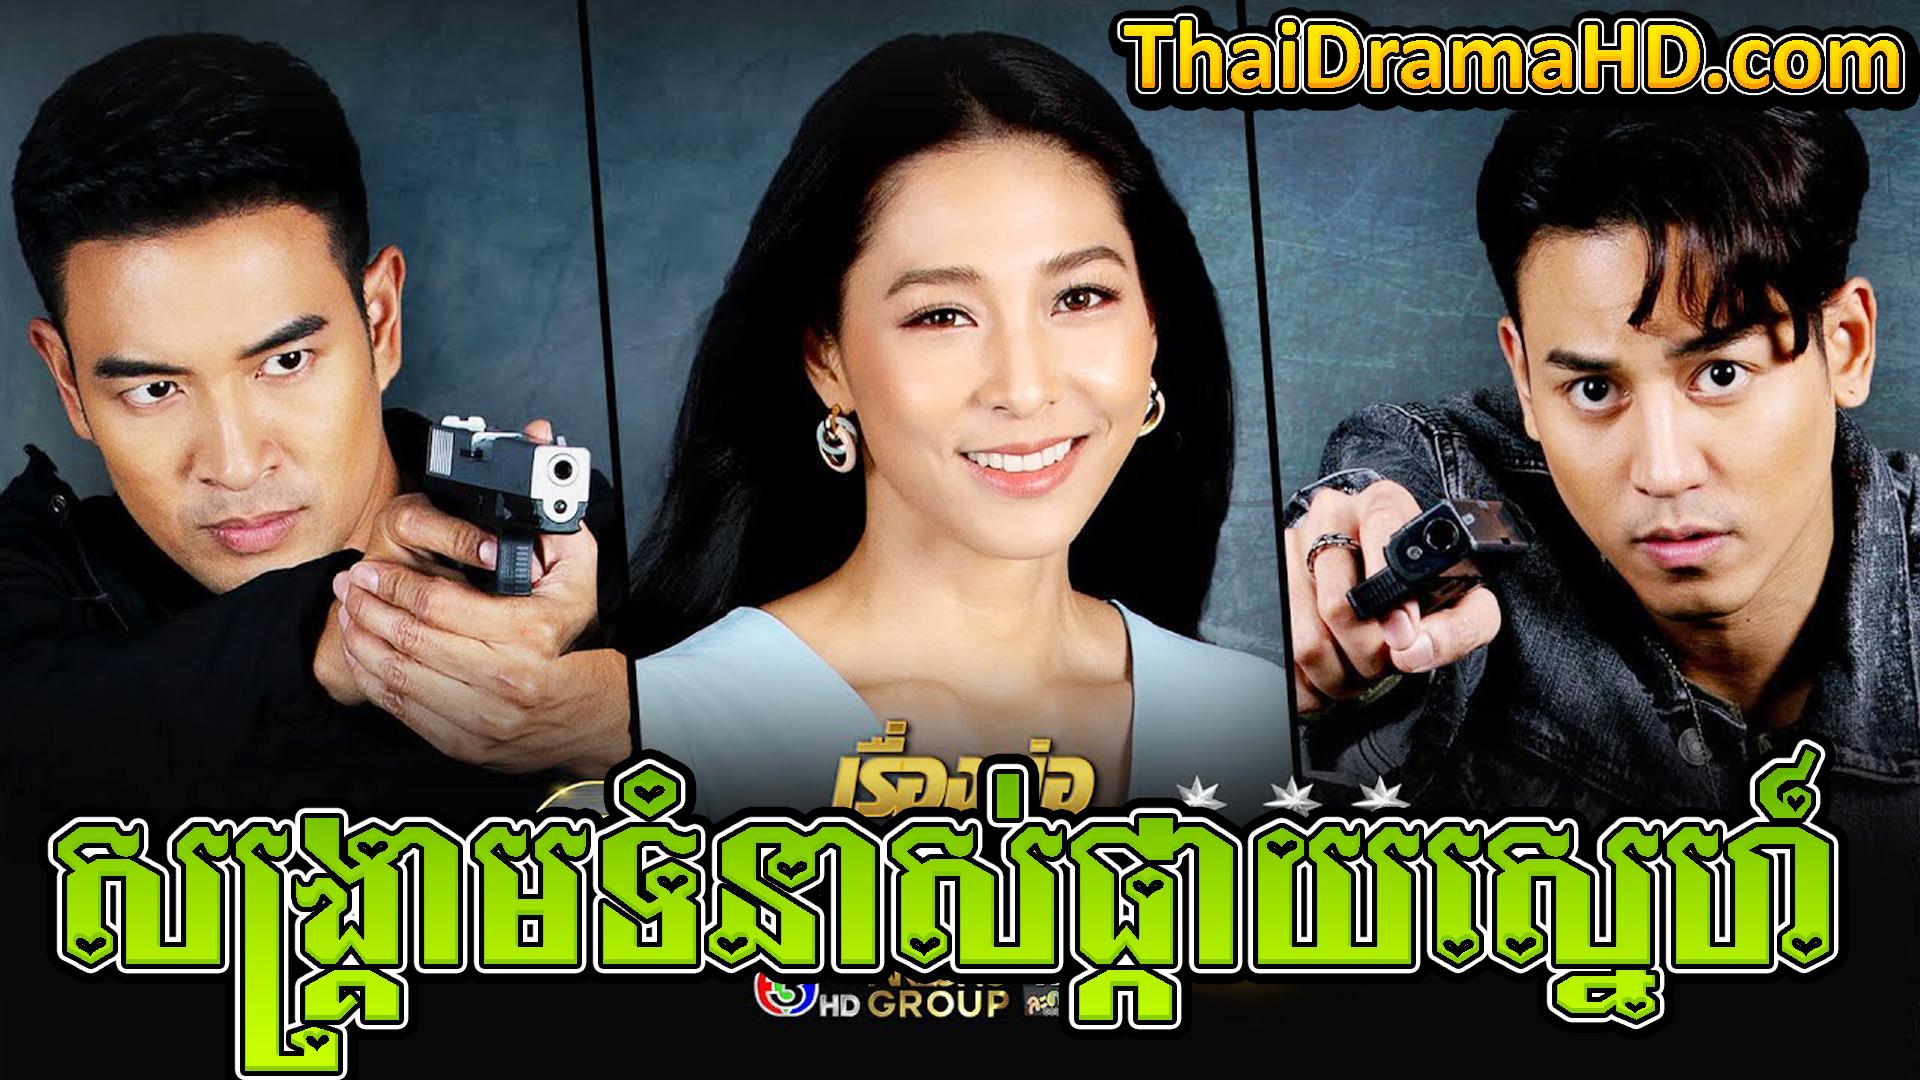 Sangkream Tomnoas Phkay Sne | Thai Drama | Khmer Movie | Phumikhmer | movie-khmer | video4khmer | khmotions | kolabkhmer | khmer drama | ksdrama | cookingtips | roscheat | khmertimeskh | khmerkomsan | phumi7 | merlkon | film2us | movie2kh | sweetdrama | khmercitylove | khreplay | tvb cambodia drama | ckh7 | srokthai | phumimedia | phumi8 | khmer avenue | khmer search | Soyo | khmerfans